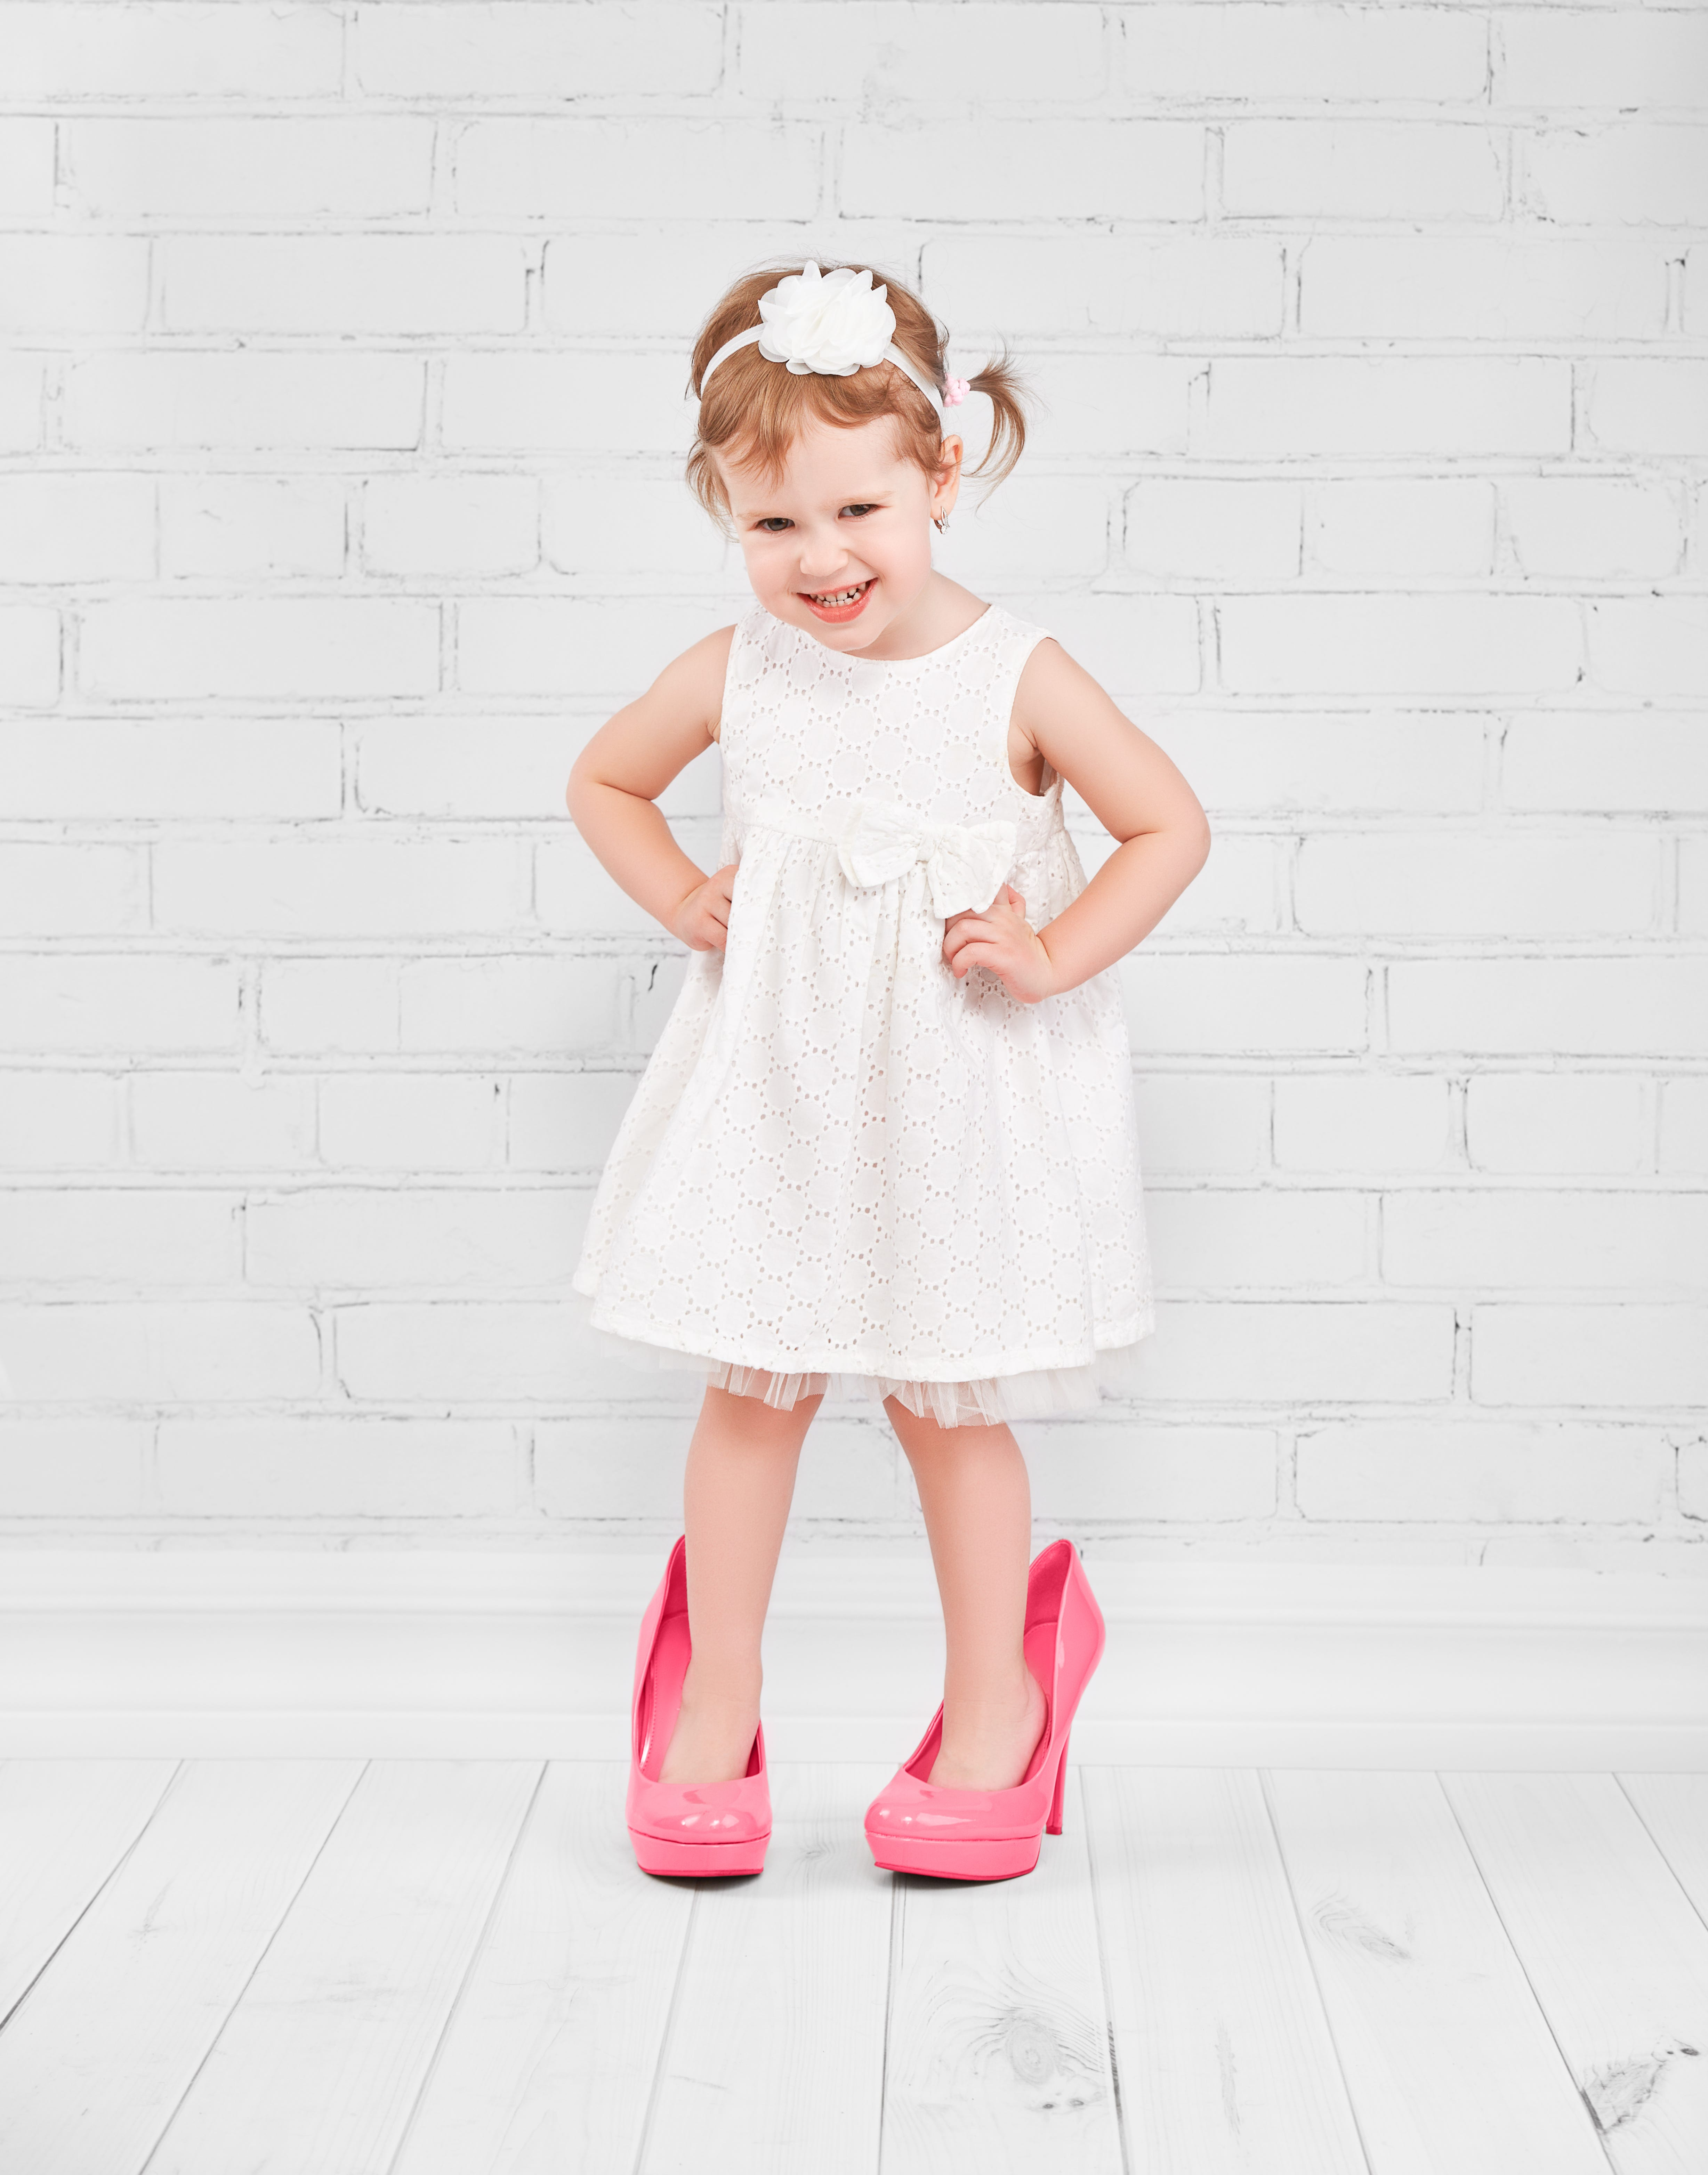 baby in high heels before she's walking